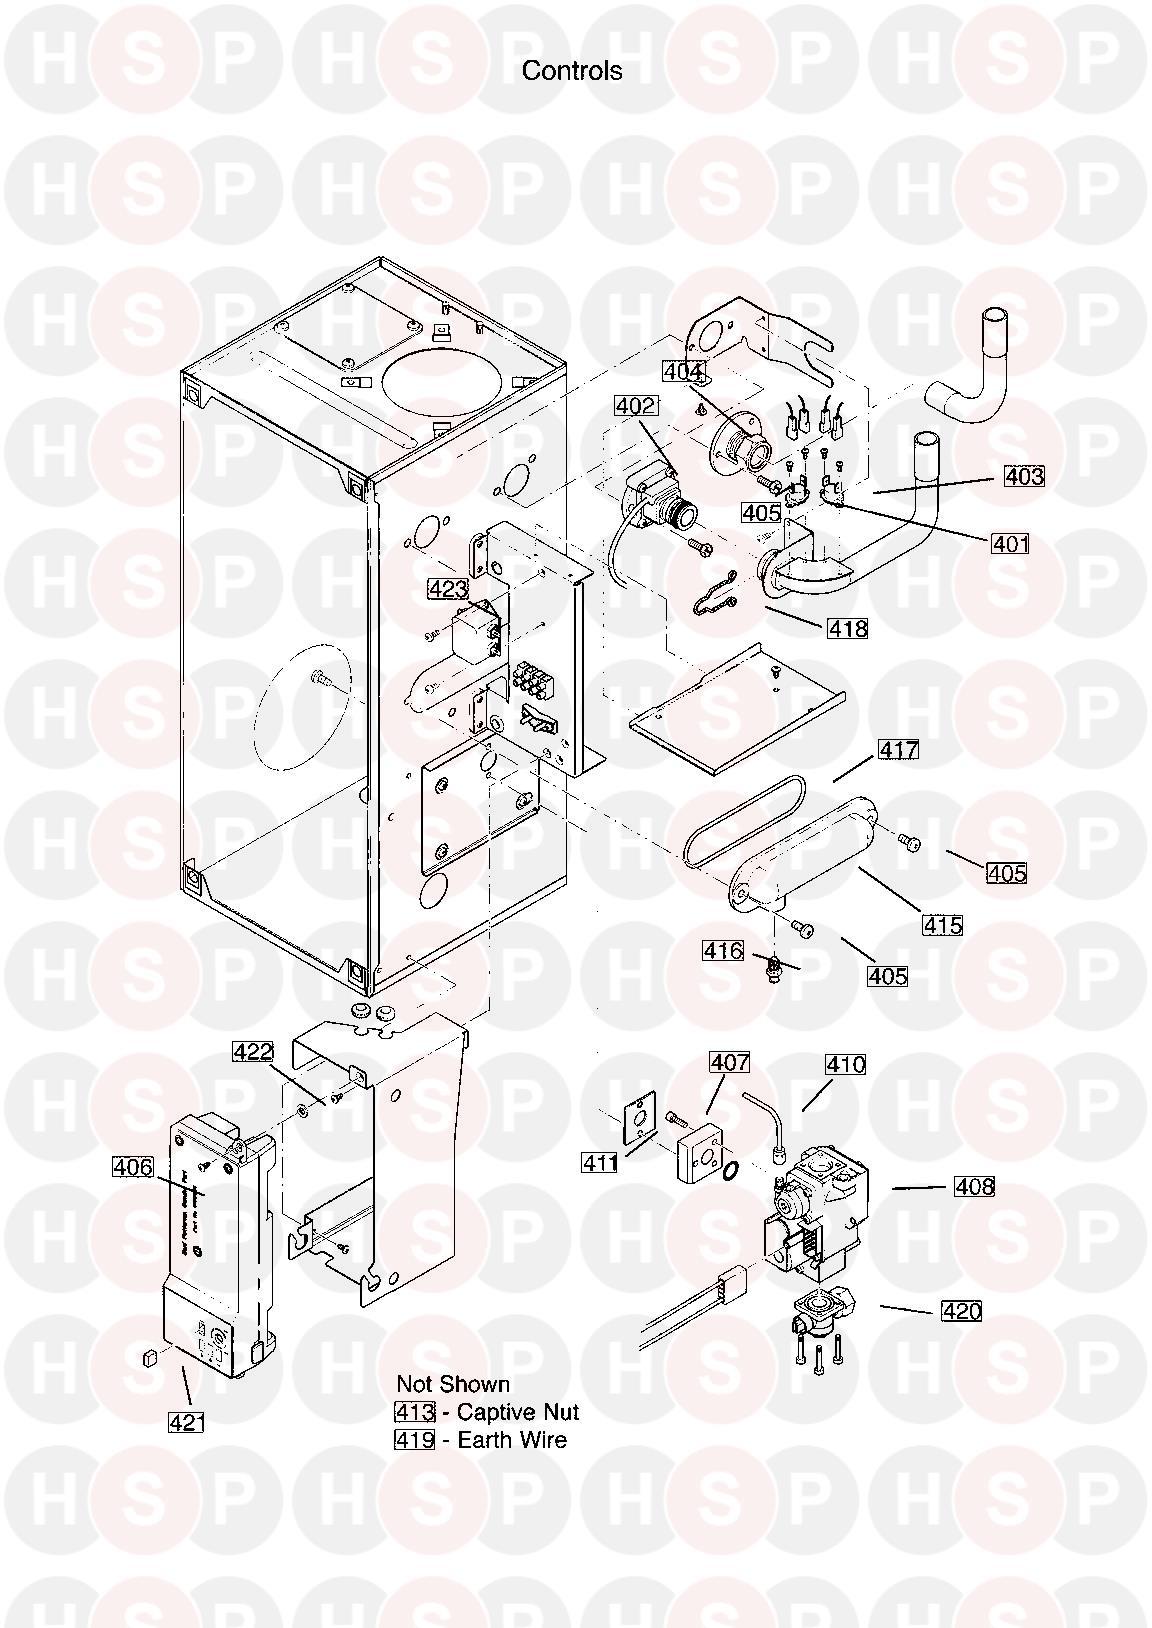 baxi solo 30 he a appliance diagram  controls